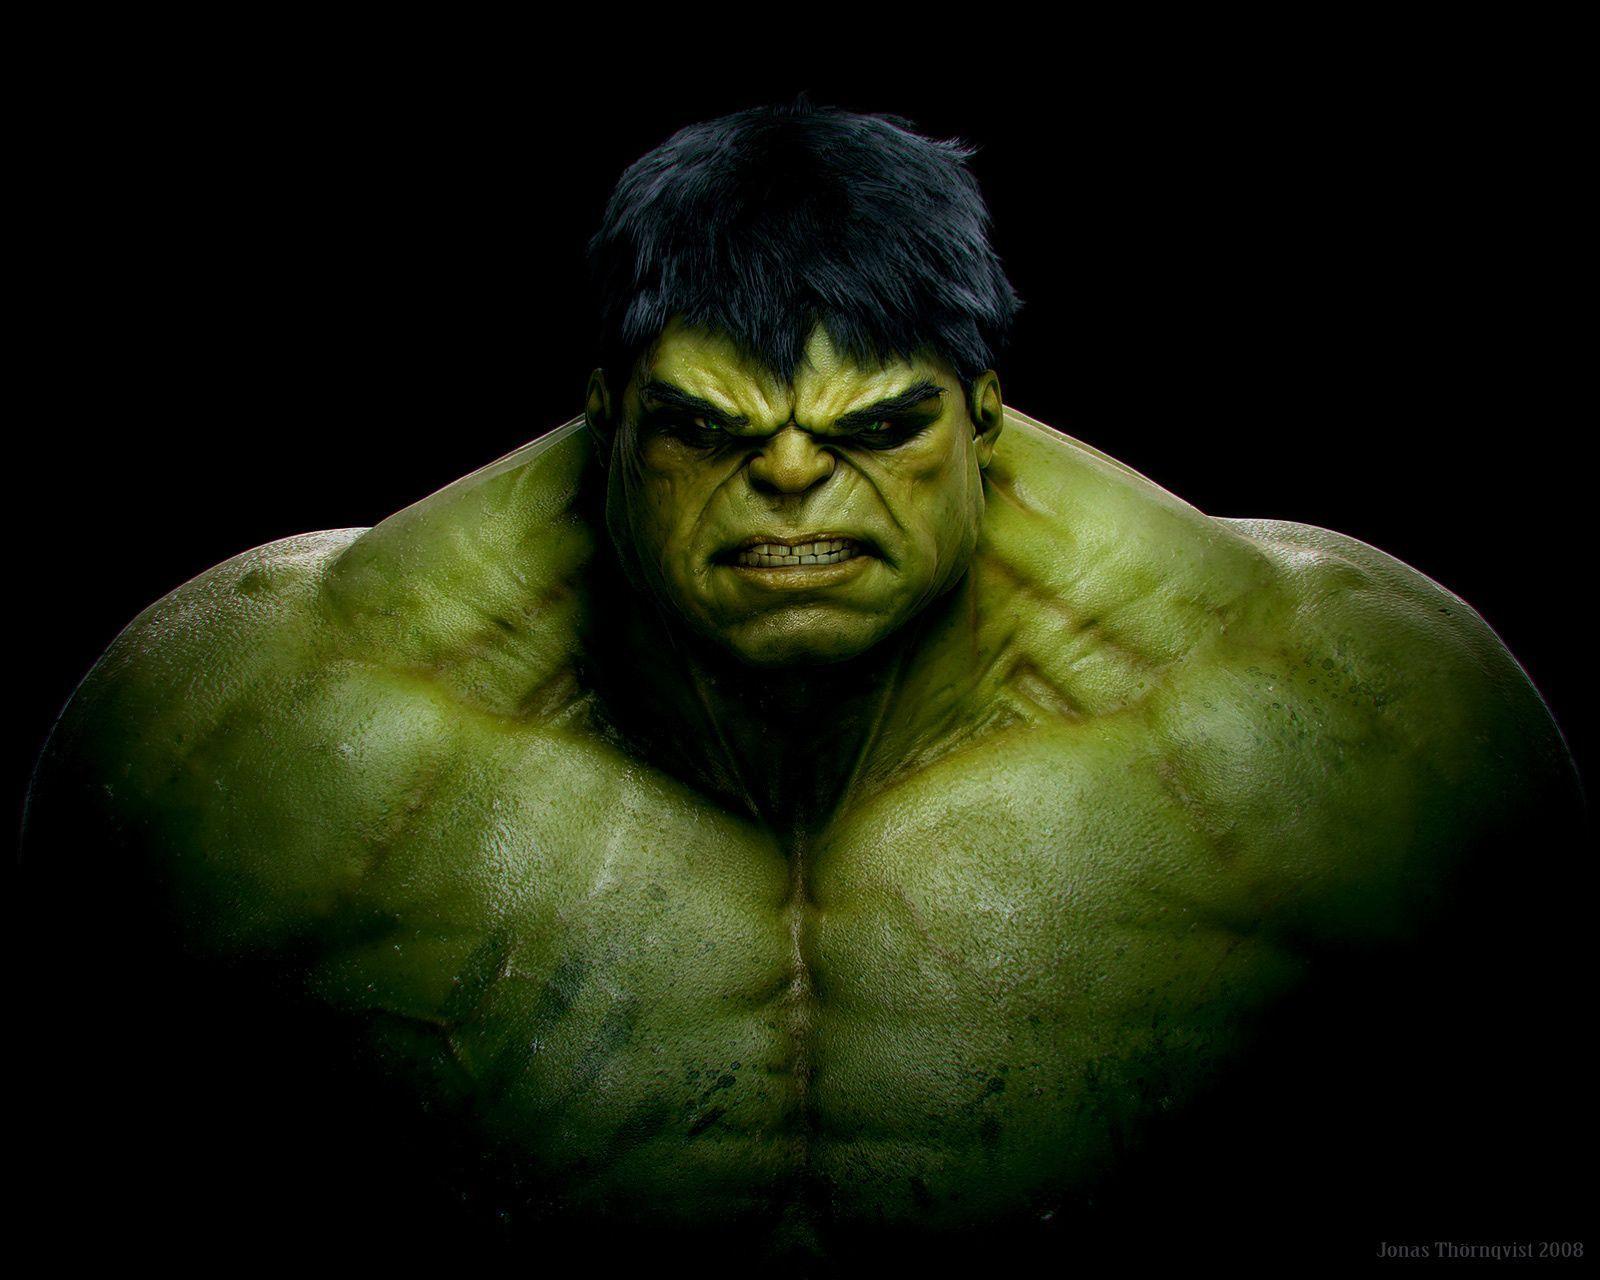 Hulk 4K Image Hd Background Wallpaper 17 HD Wallpapers